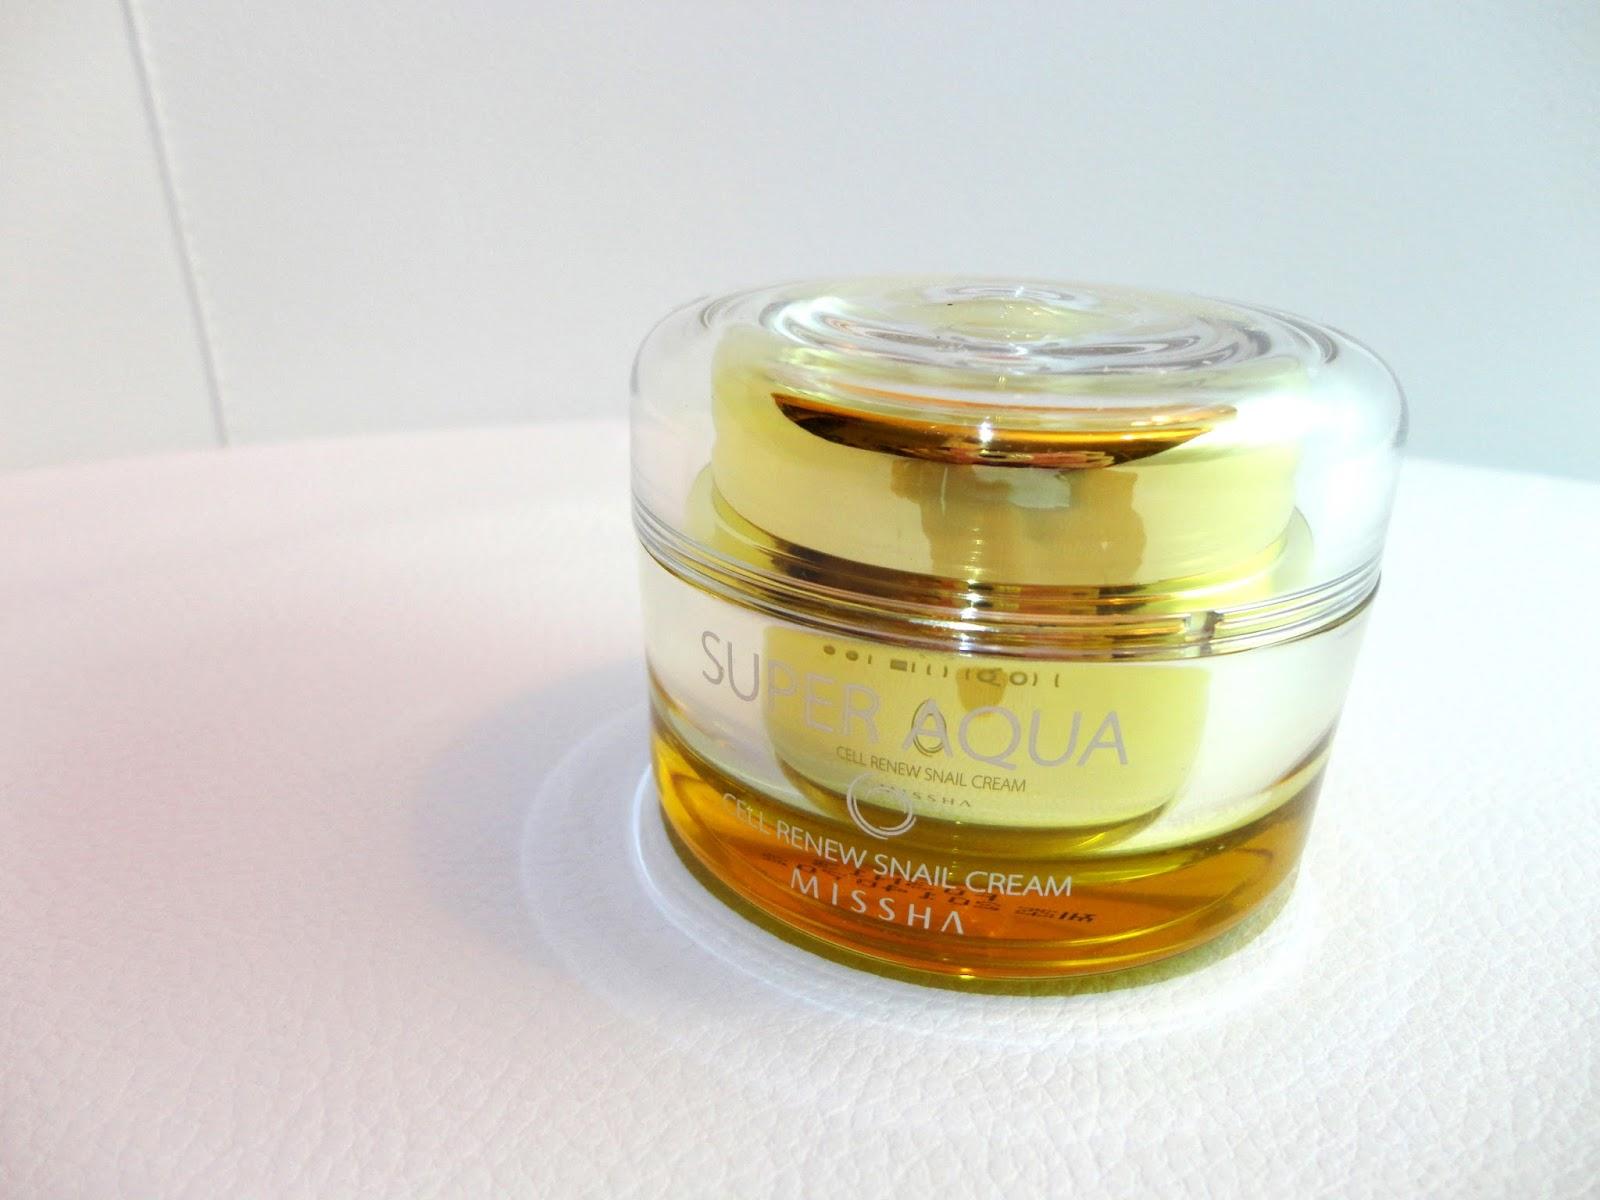 Review: Missha Cell Renew Snail Cream | BEAUTY WOO